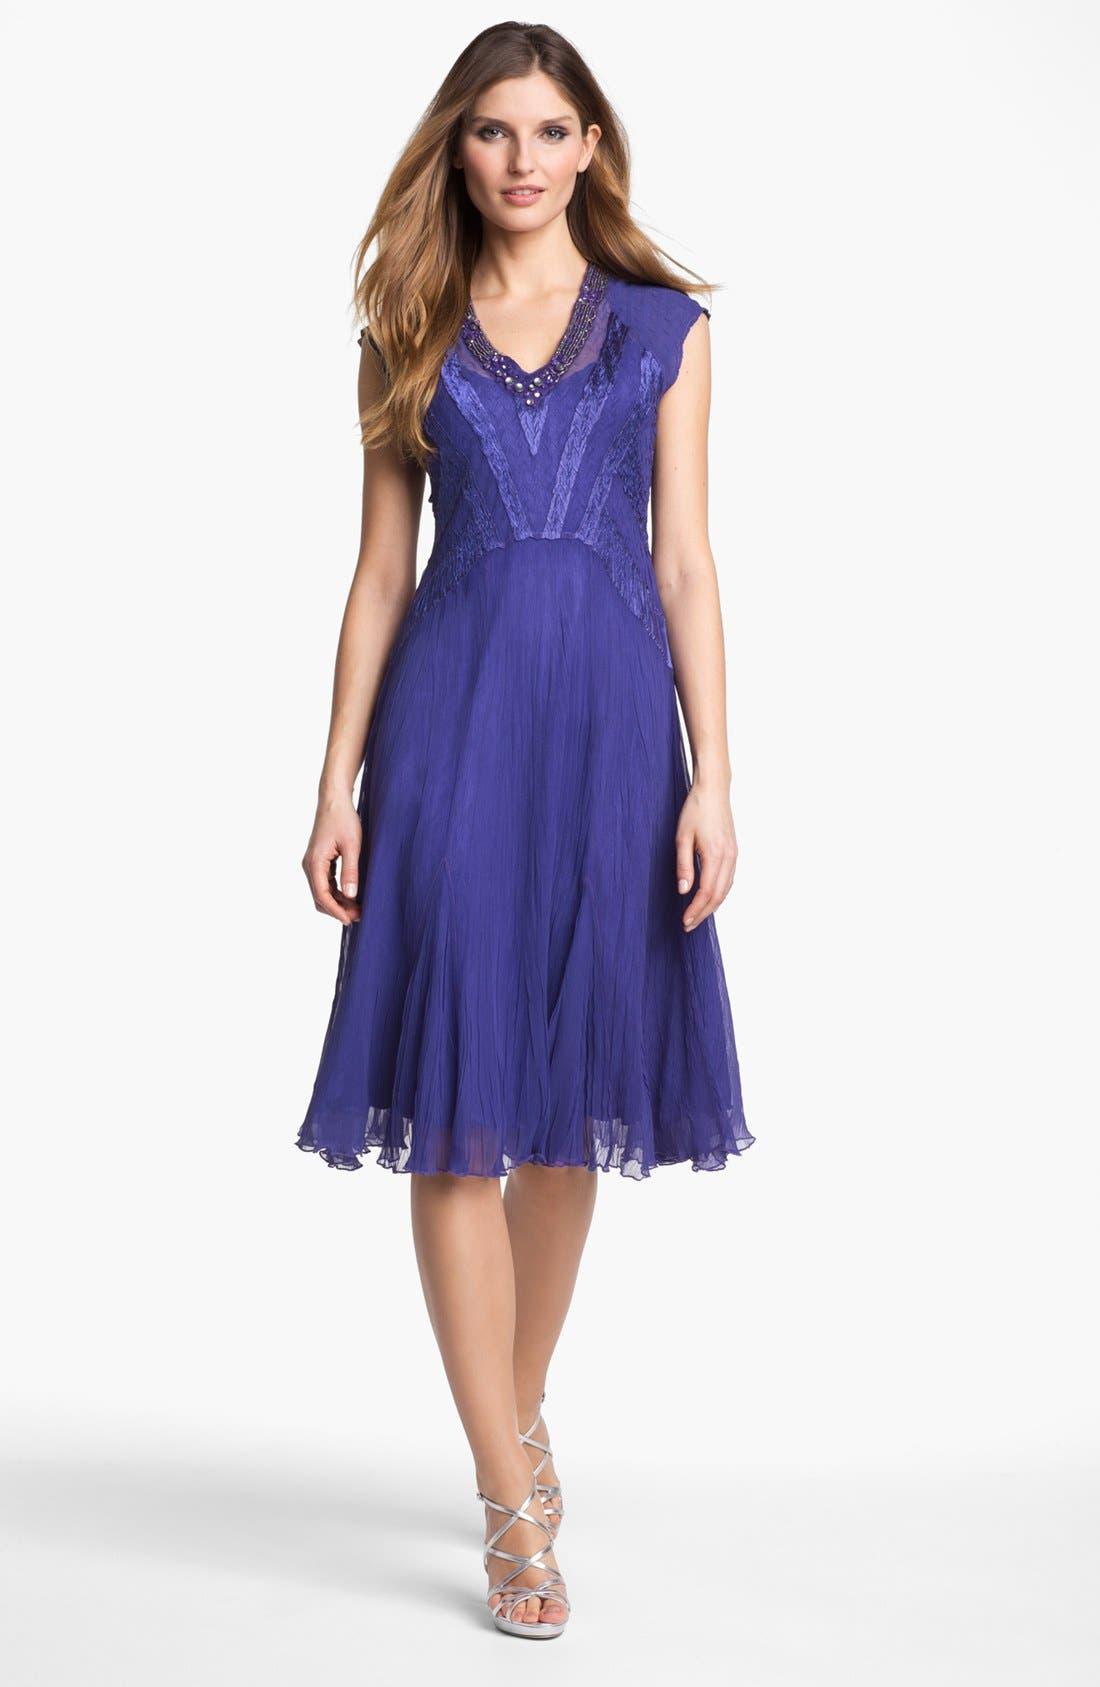 Alternate Image 1 Selected - Komarov Embellished Textured Chiffon Dress (Petite)